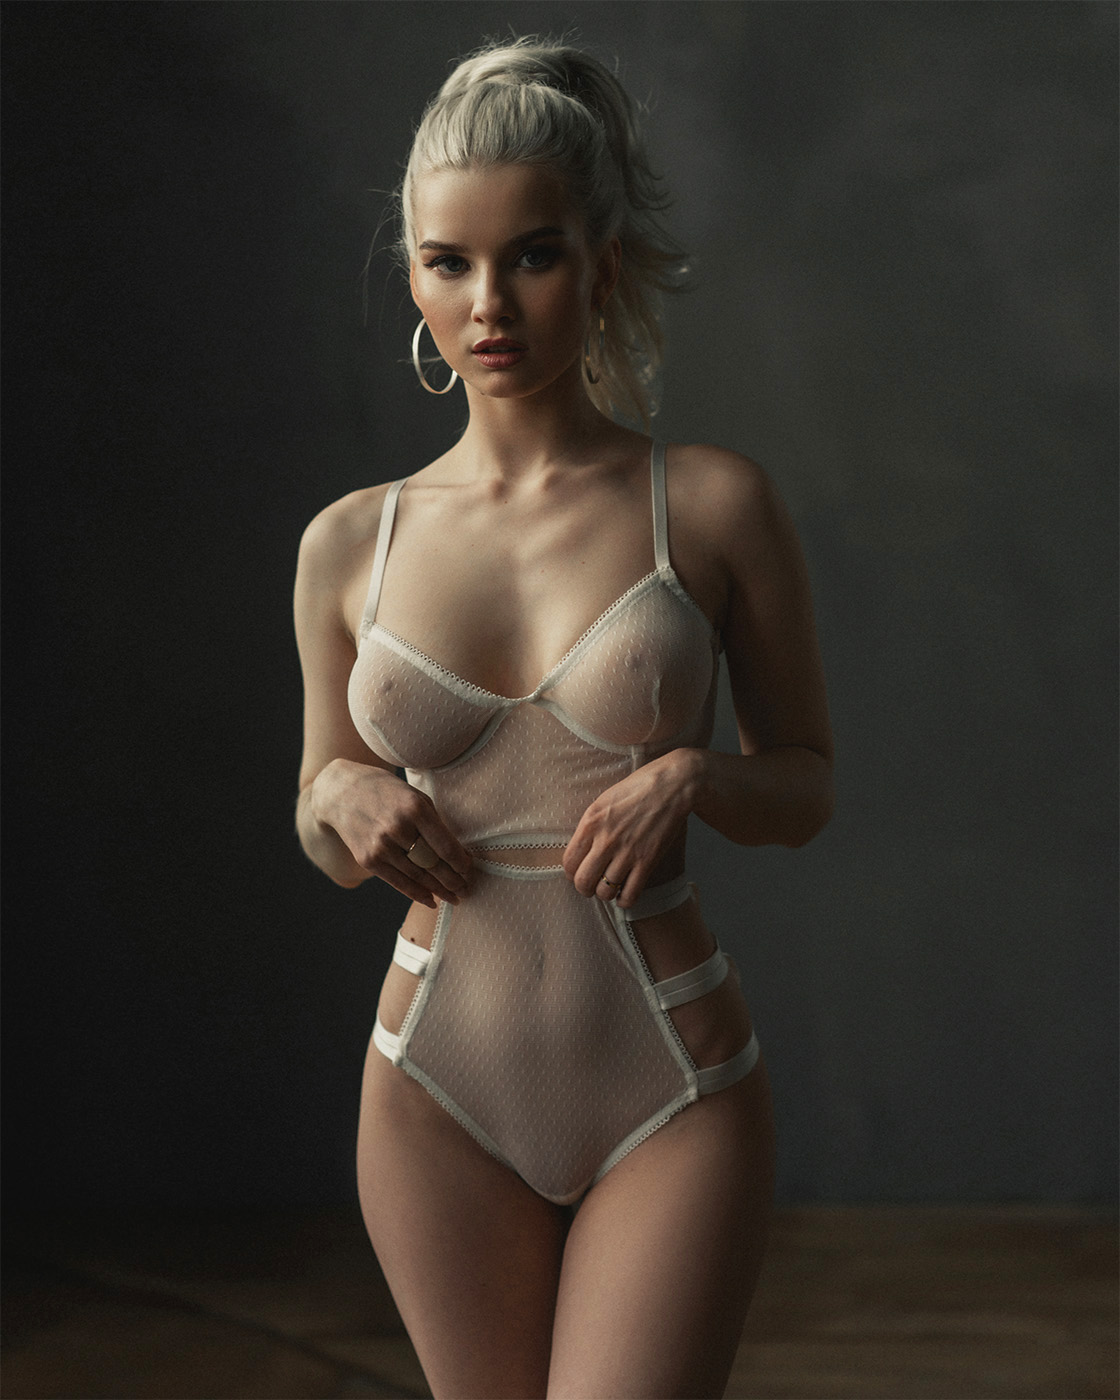 Katerina Pluchevskaya by Stas Shmel